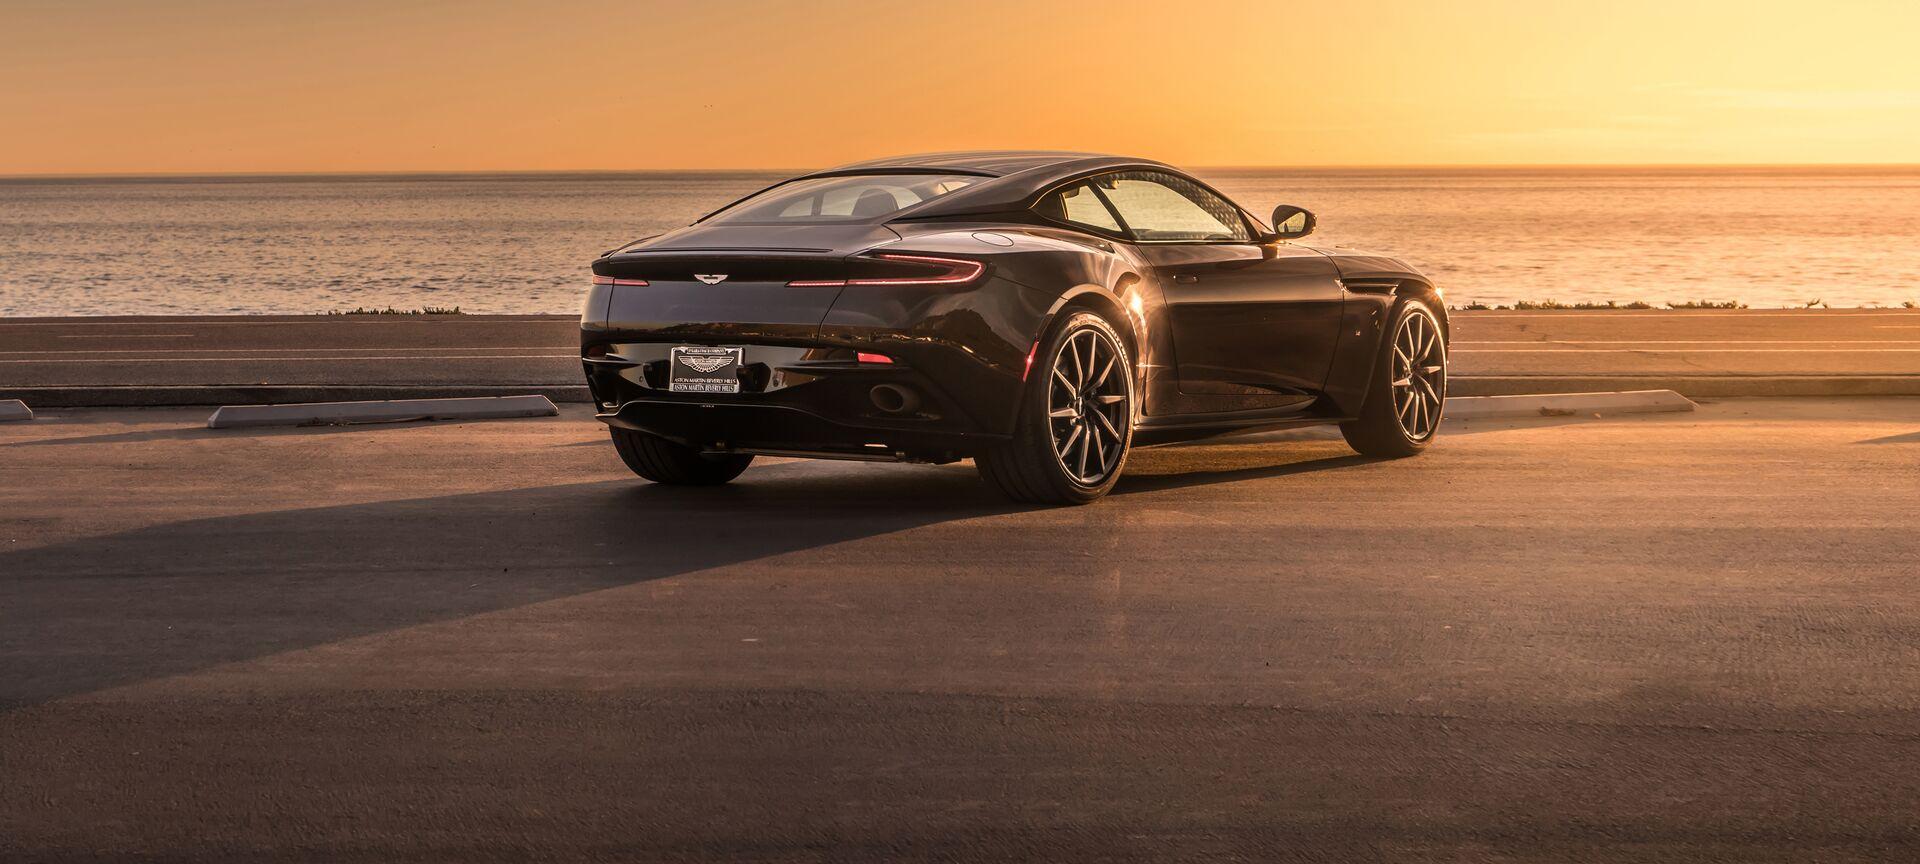 Aston Martin Beverly Hills An O Gara Coach Brand Los